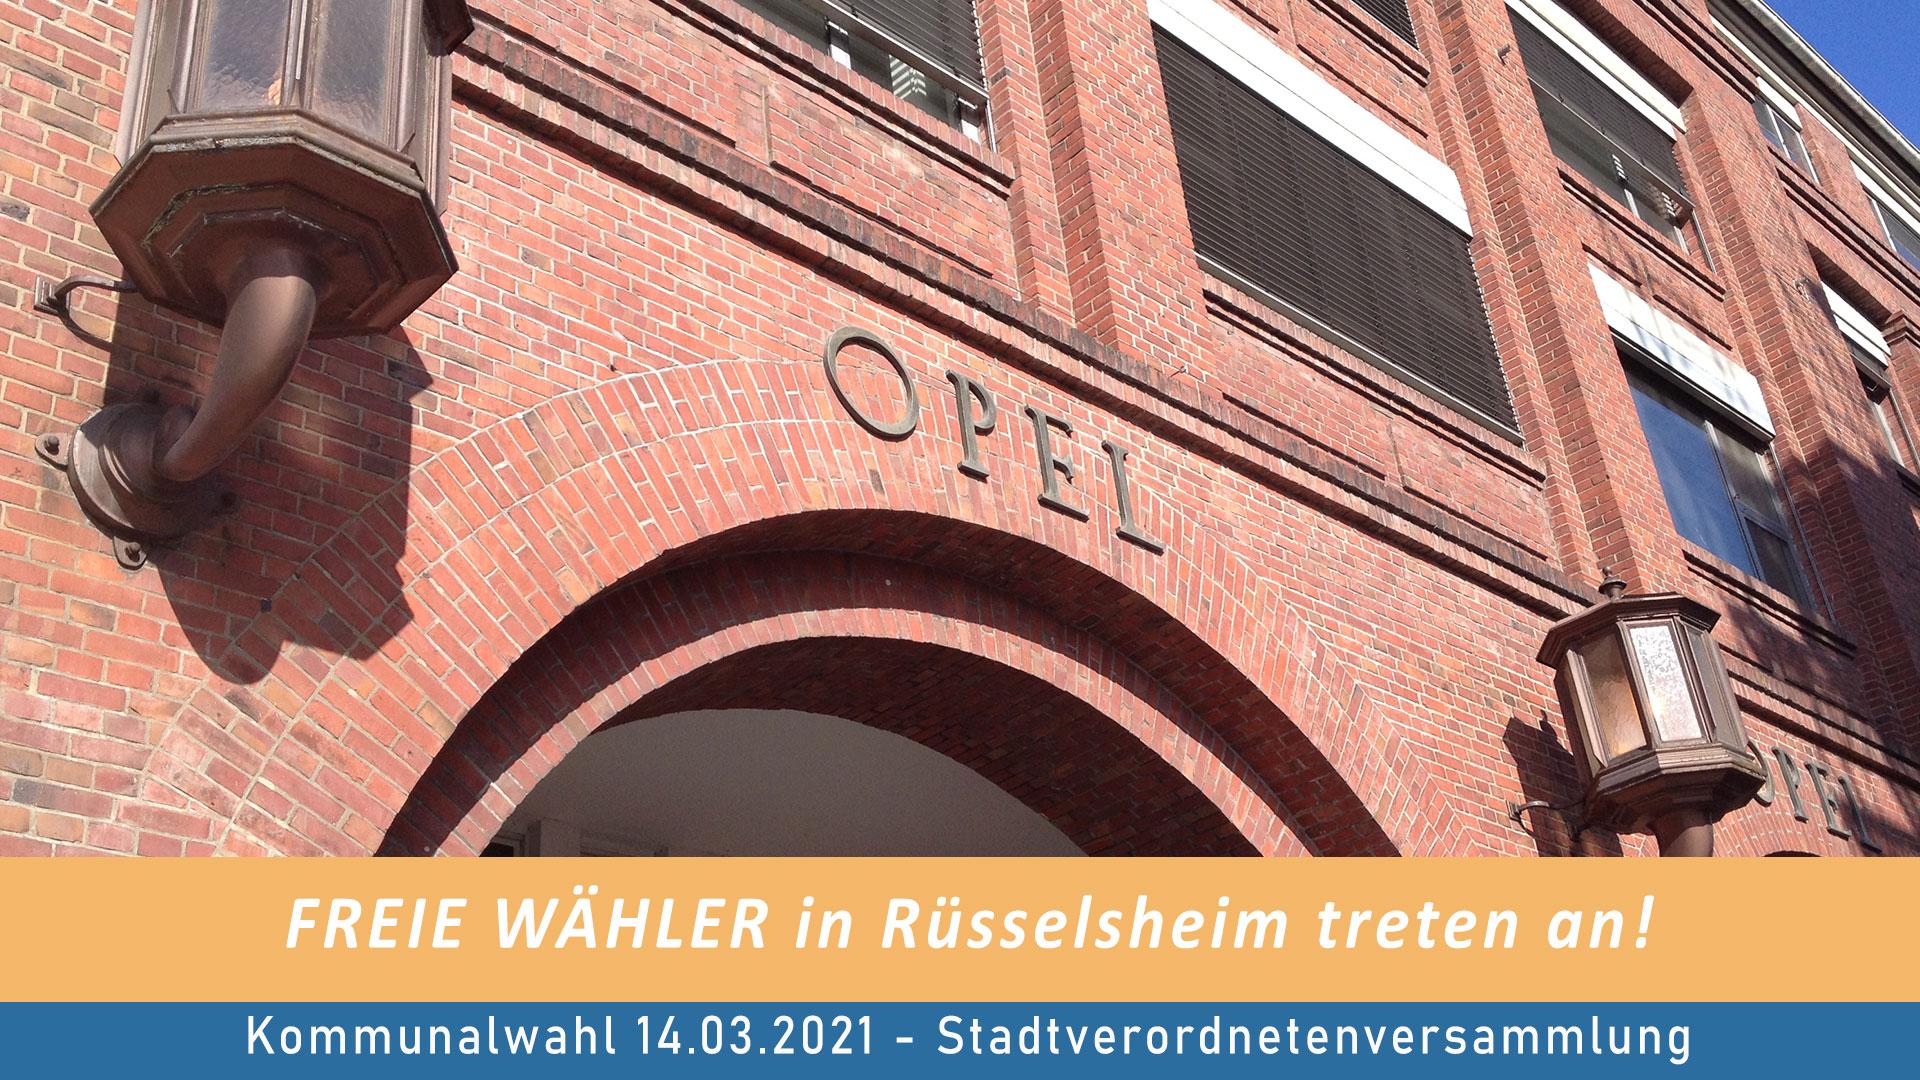 FREIE WÄHLER Rüsselsheim